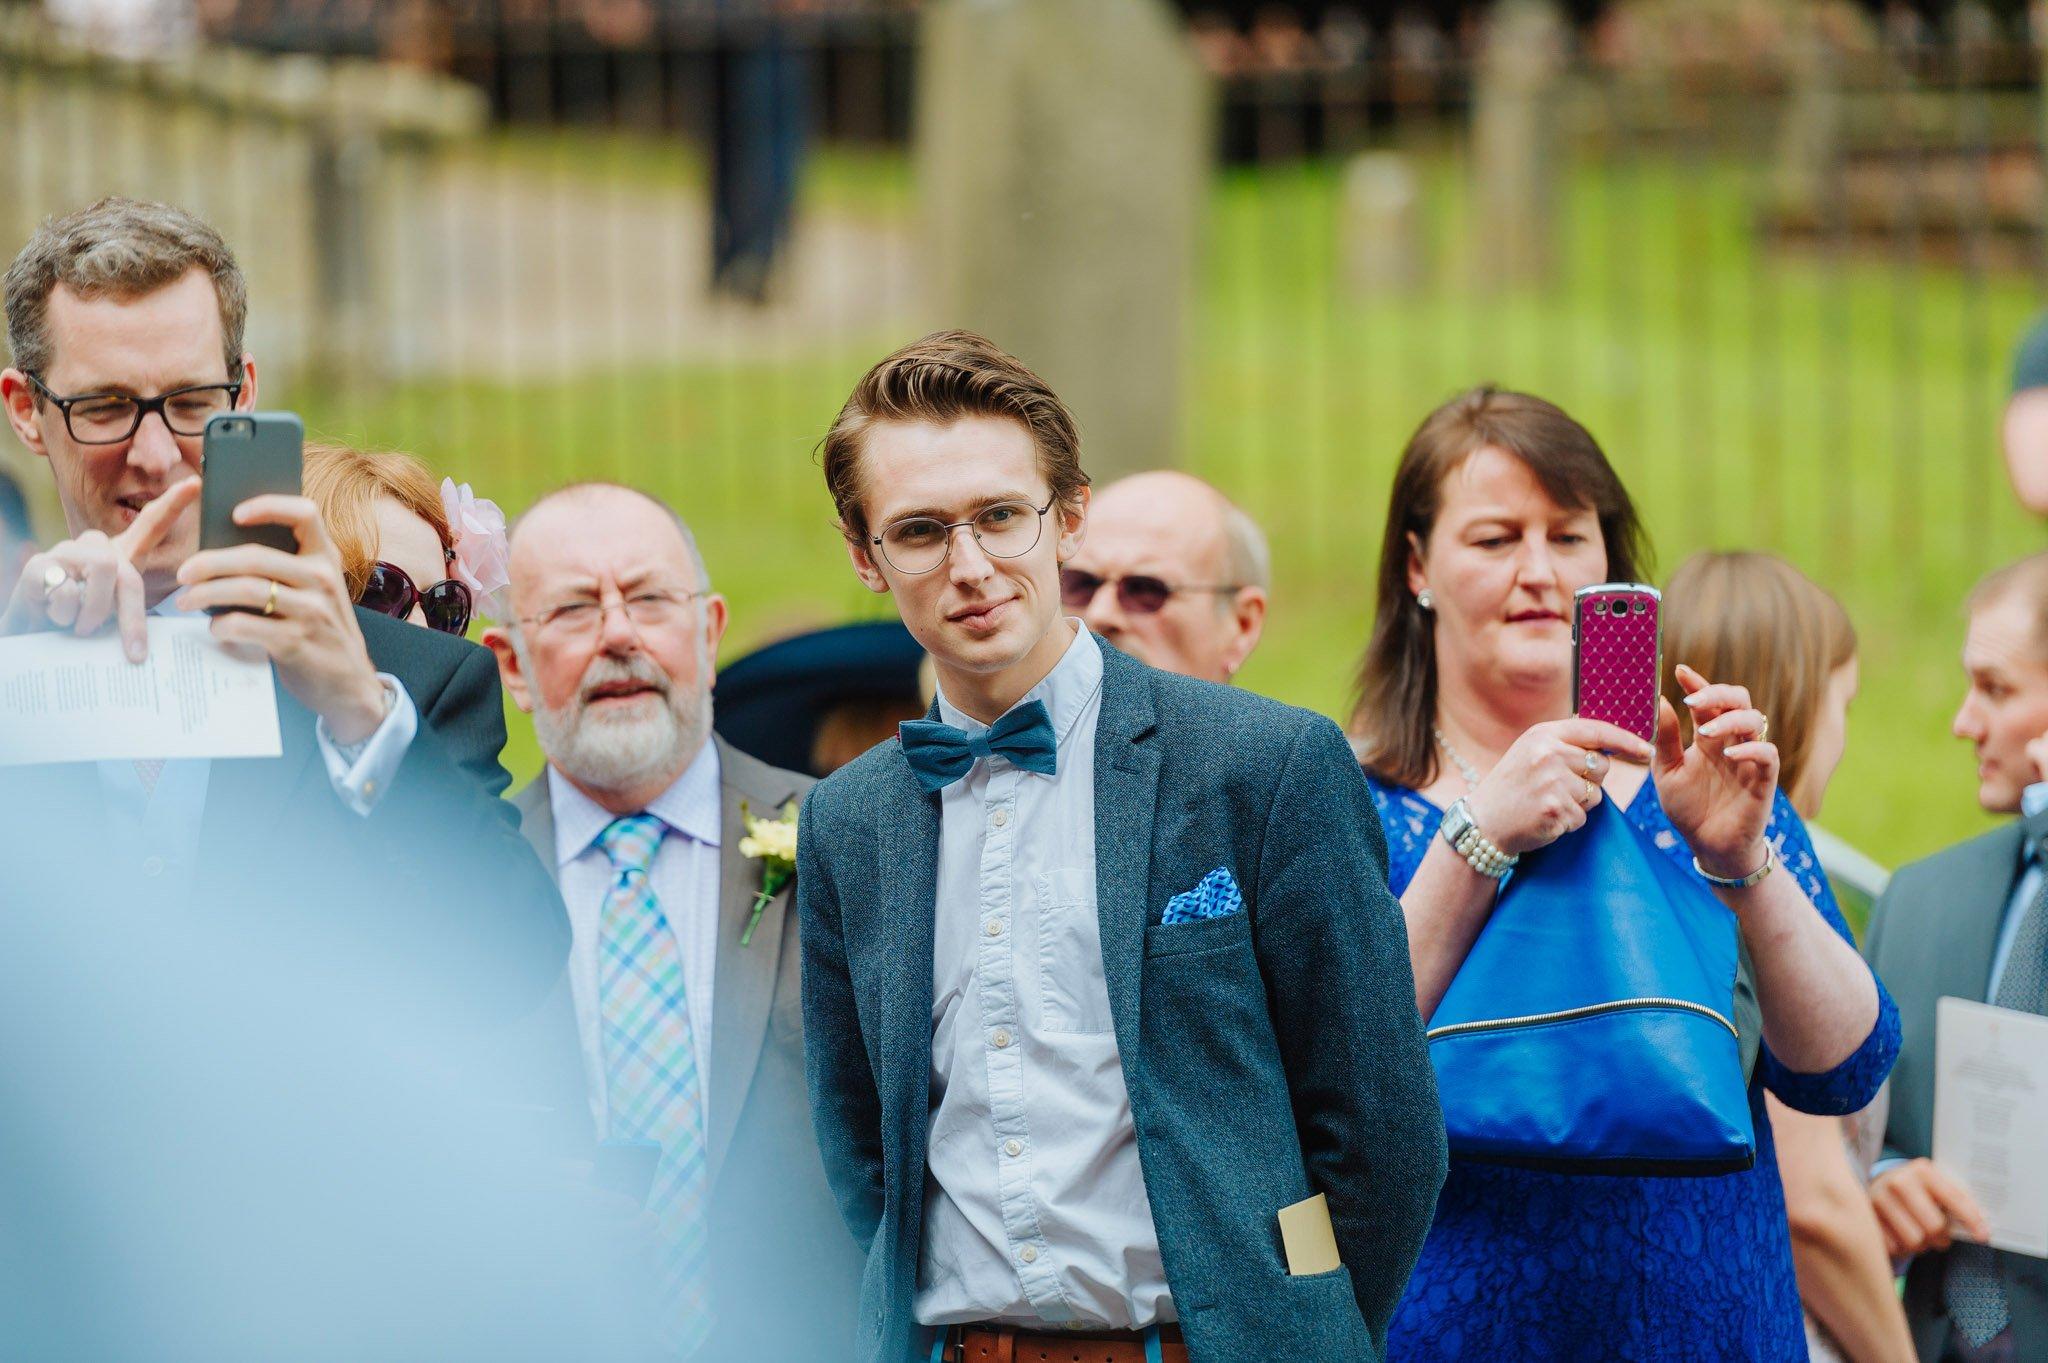 Georgina + Mike - Wedding photography in Malvern, Worcestershire 35